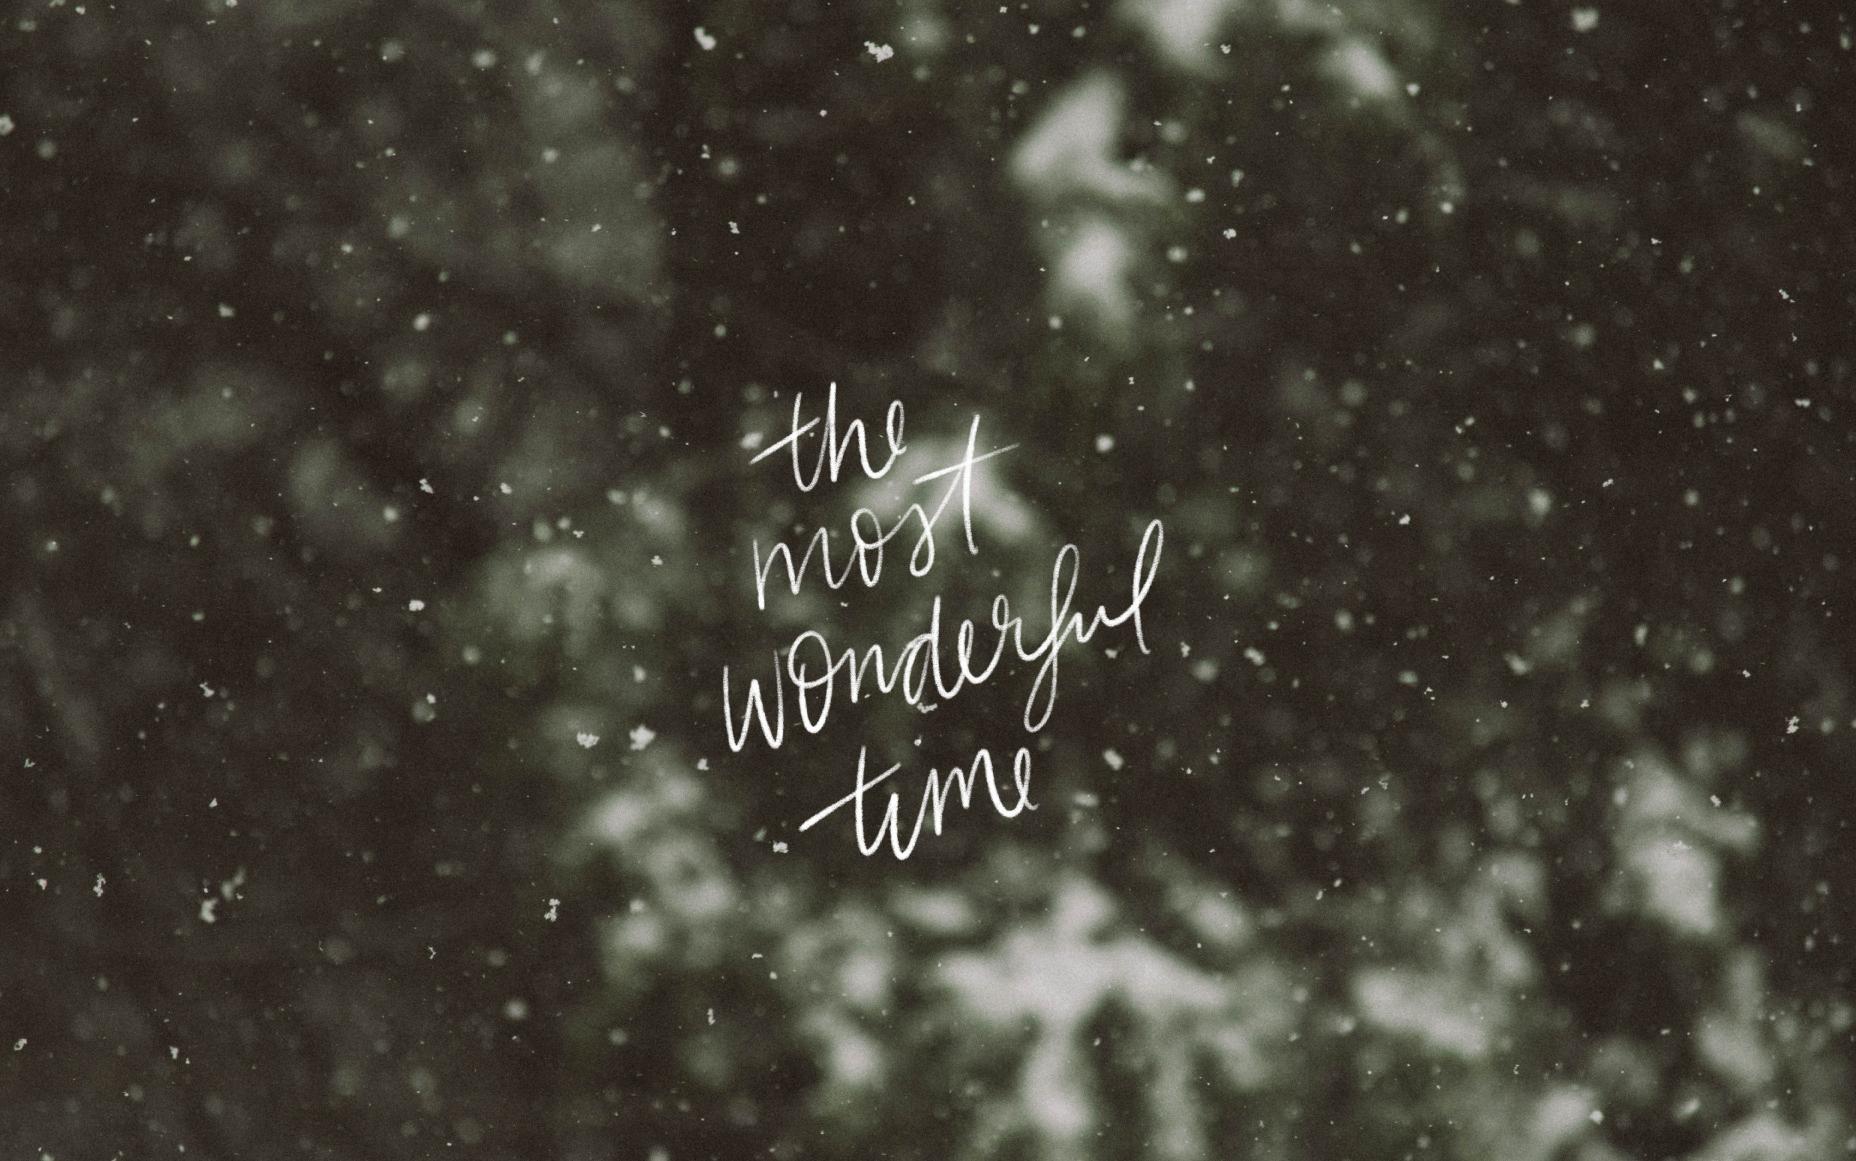 Pin by Amy Garrison on Winter ️ Christmas desktop